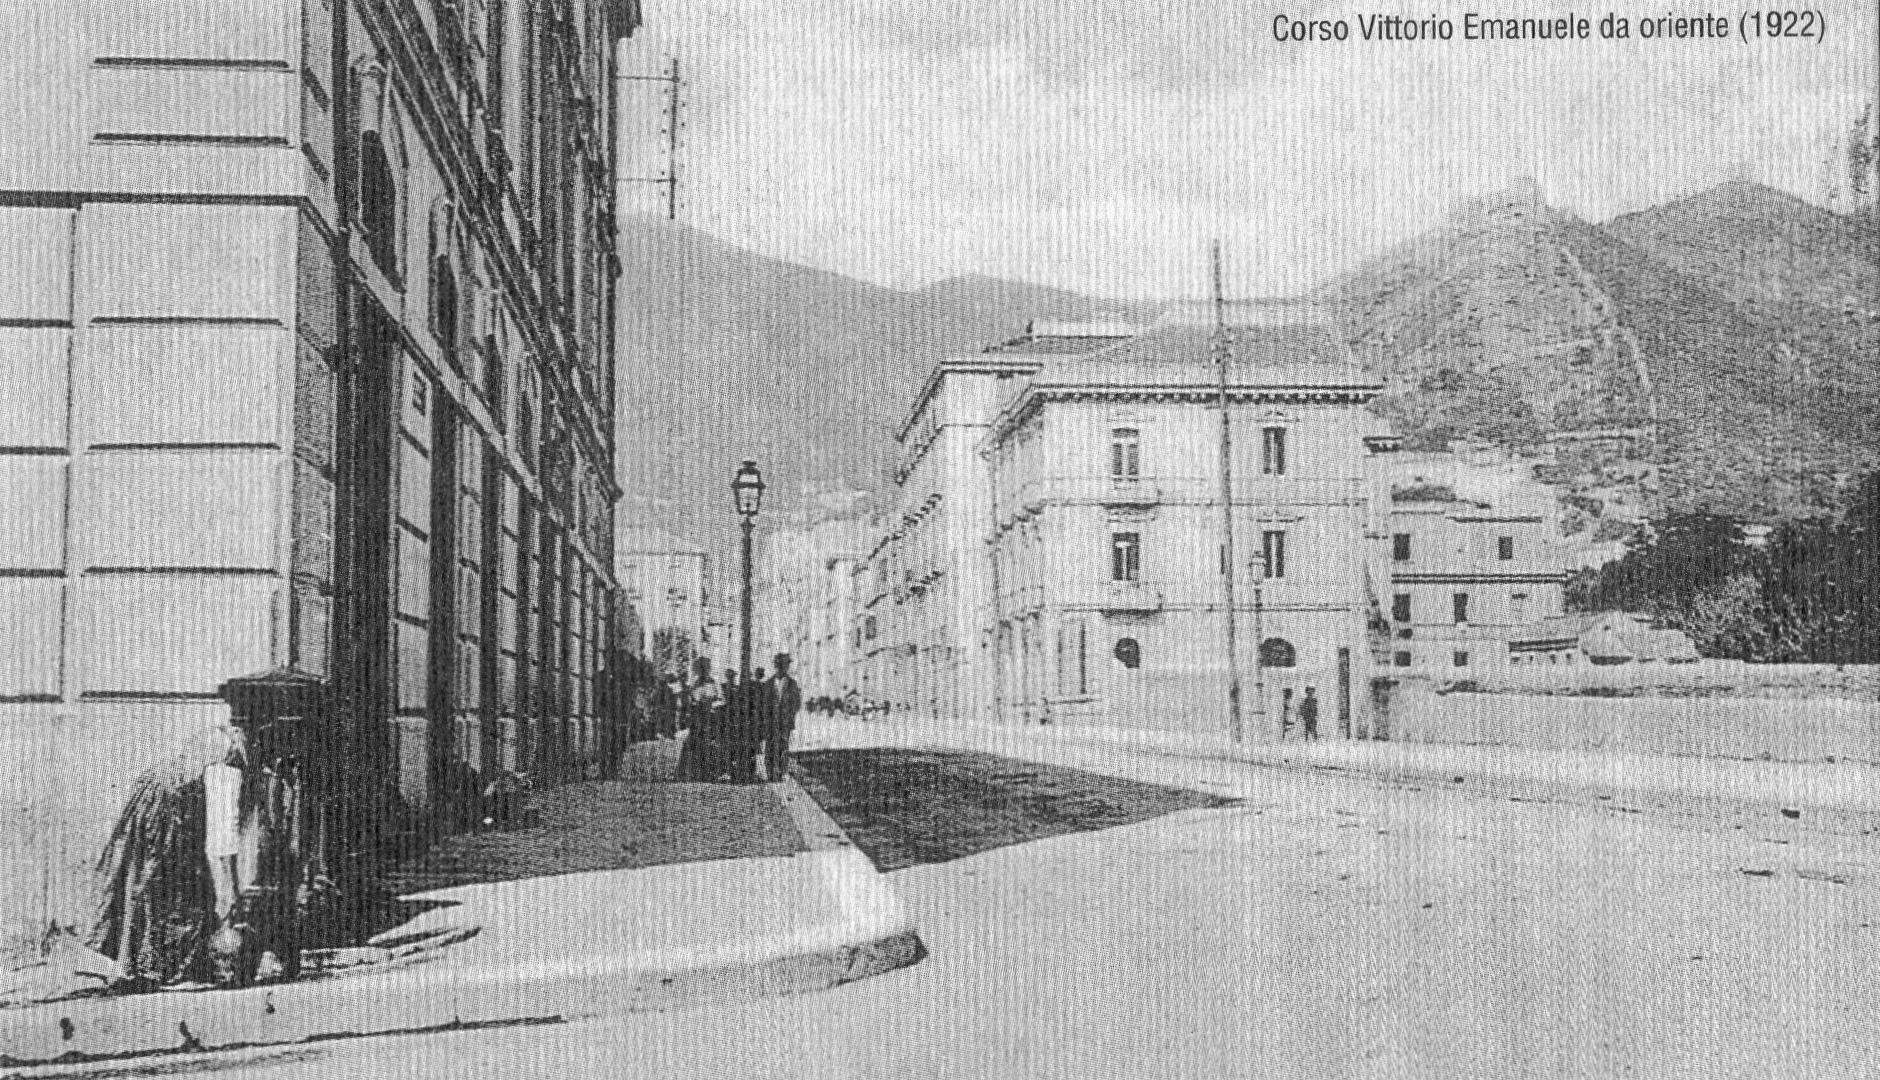 Corso Vittorio Emanuele (1922)